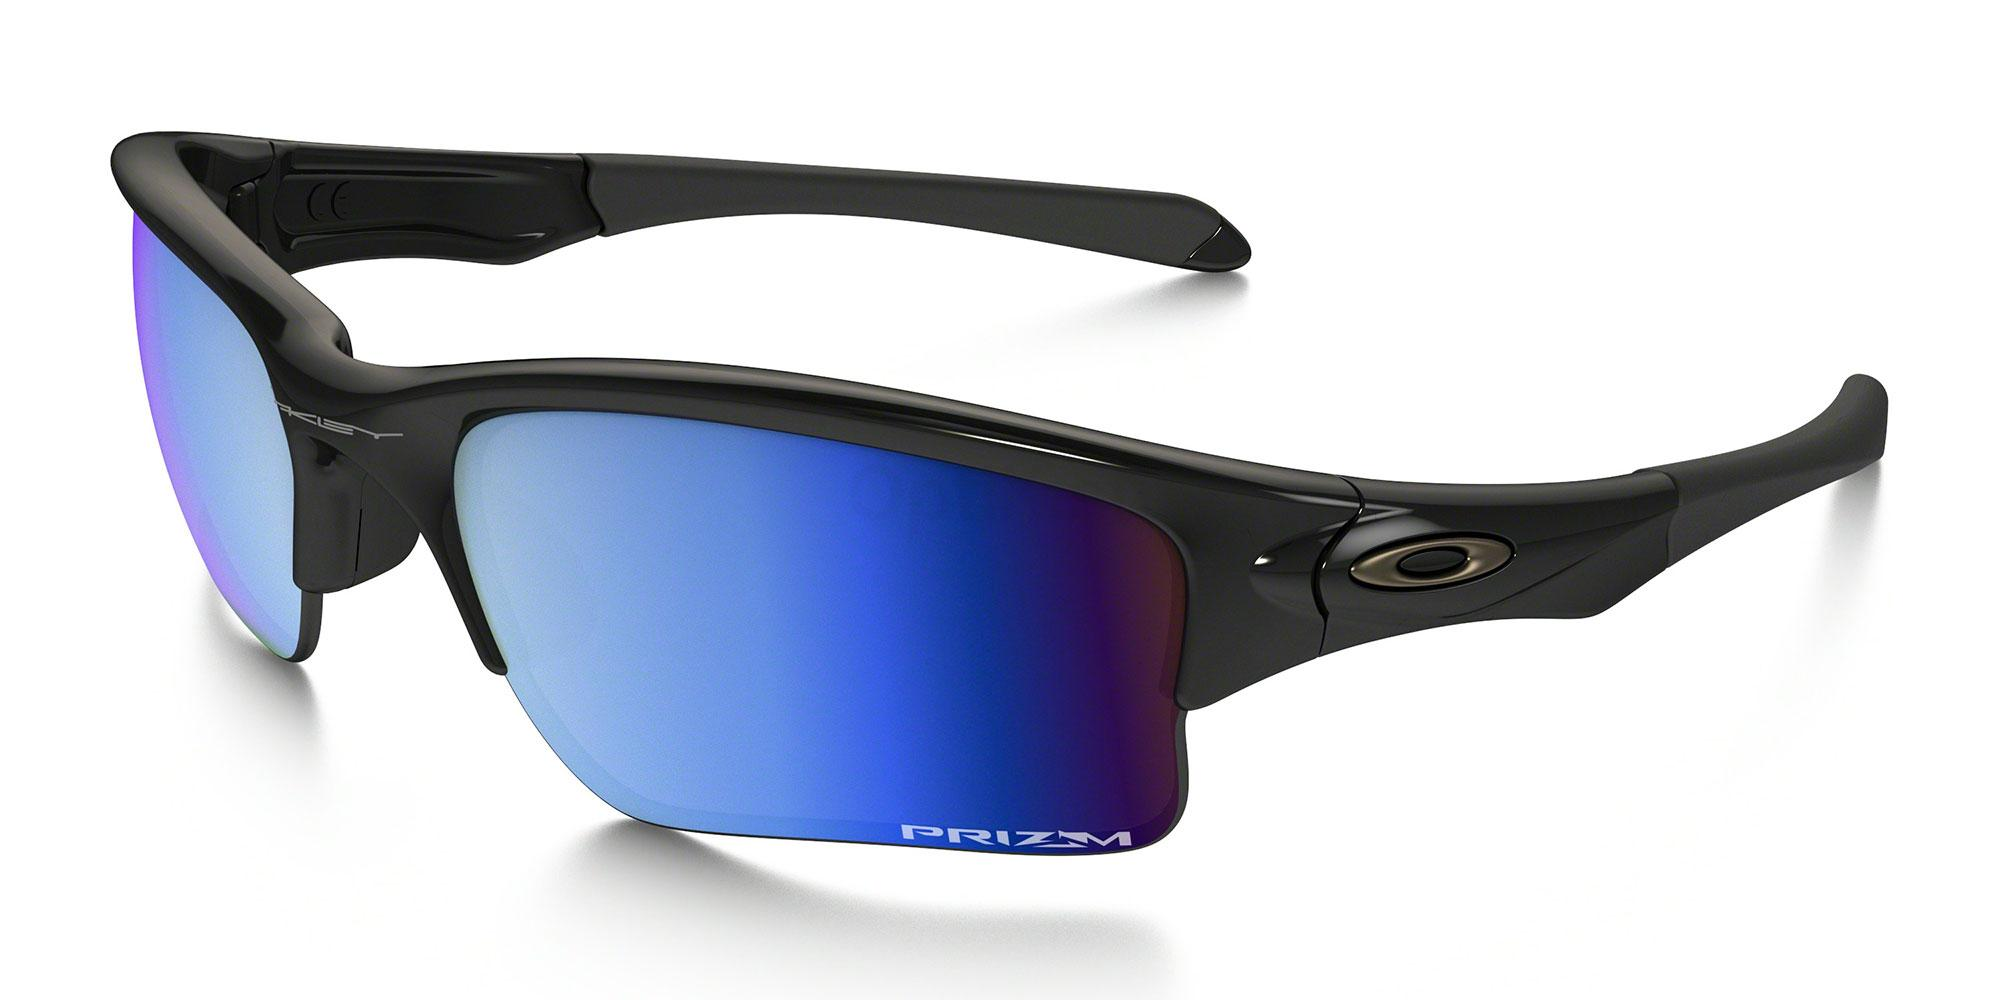 920016 OO9200 QUARTER JACKET POLARIZED Sunglasses, Oakley